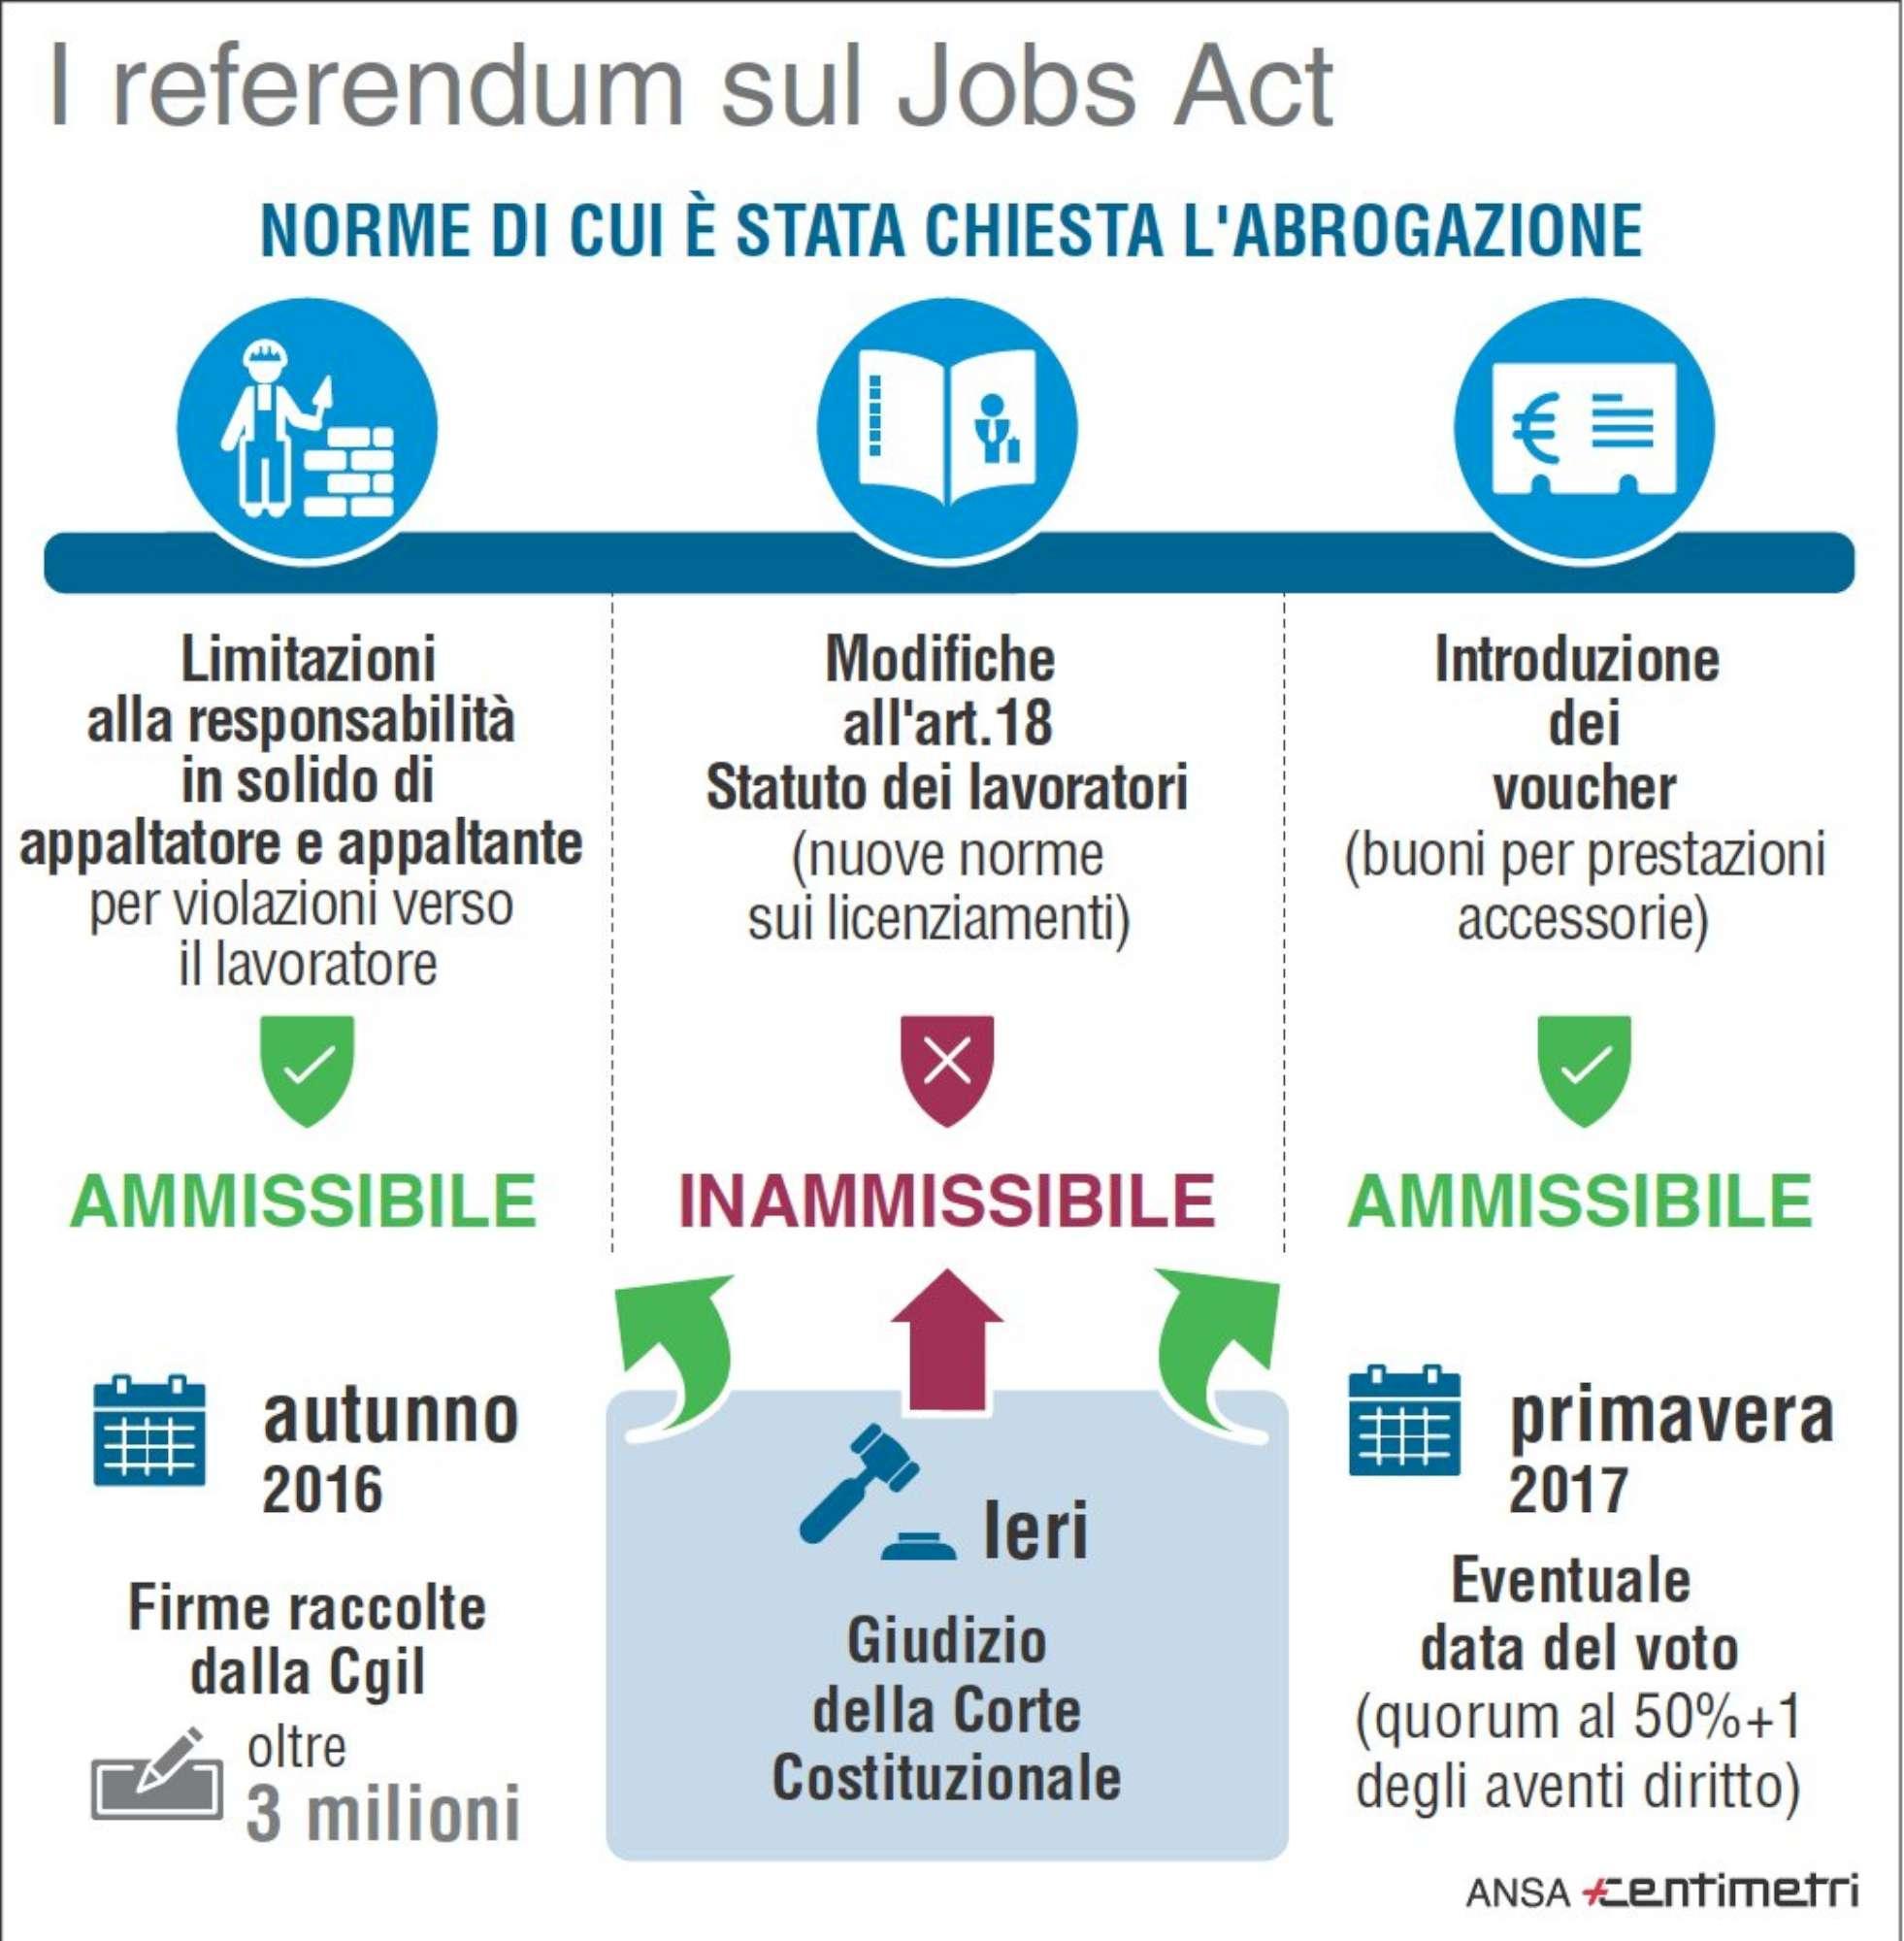 Jobs Act, no della Consulta al referendum sull art. 18